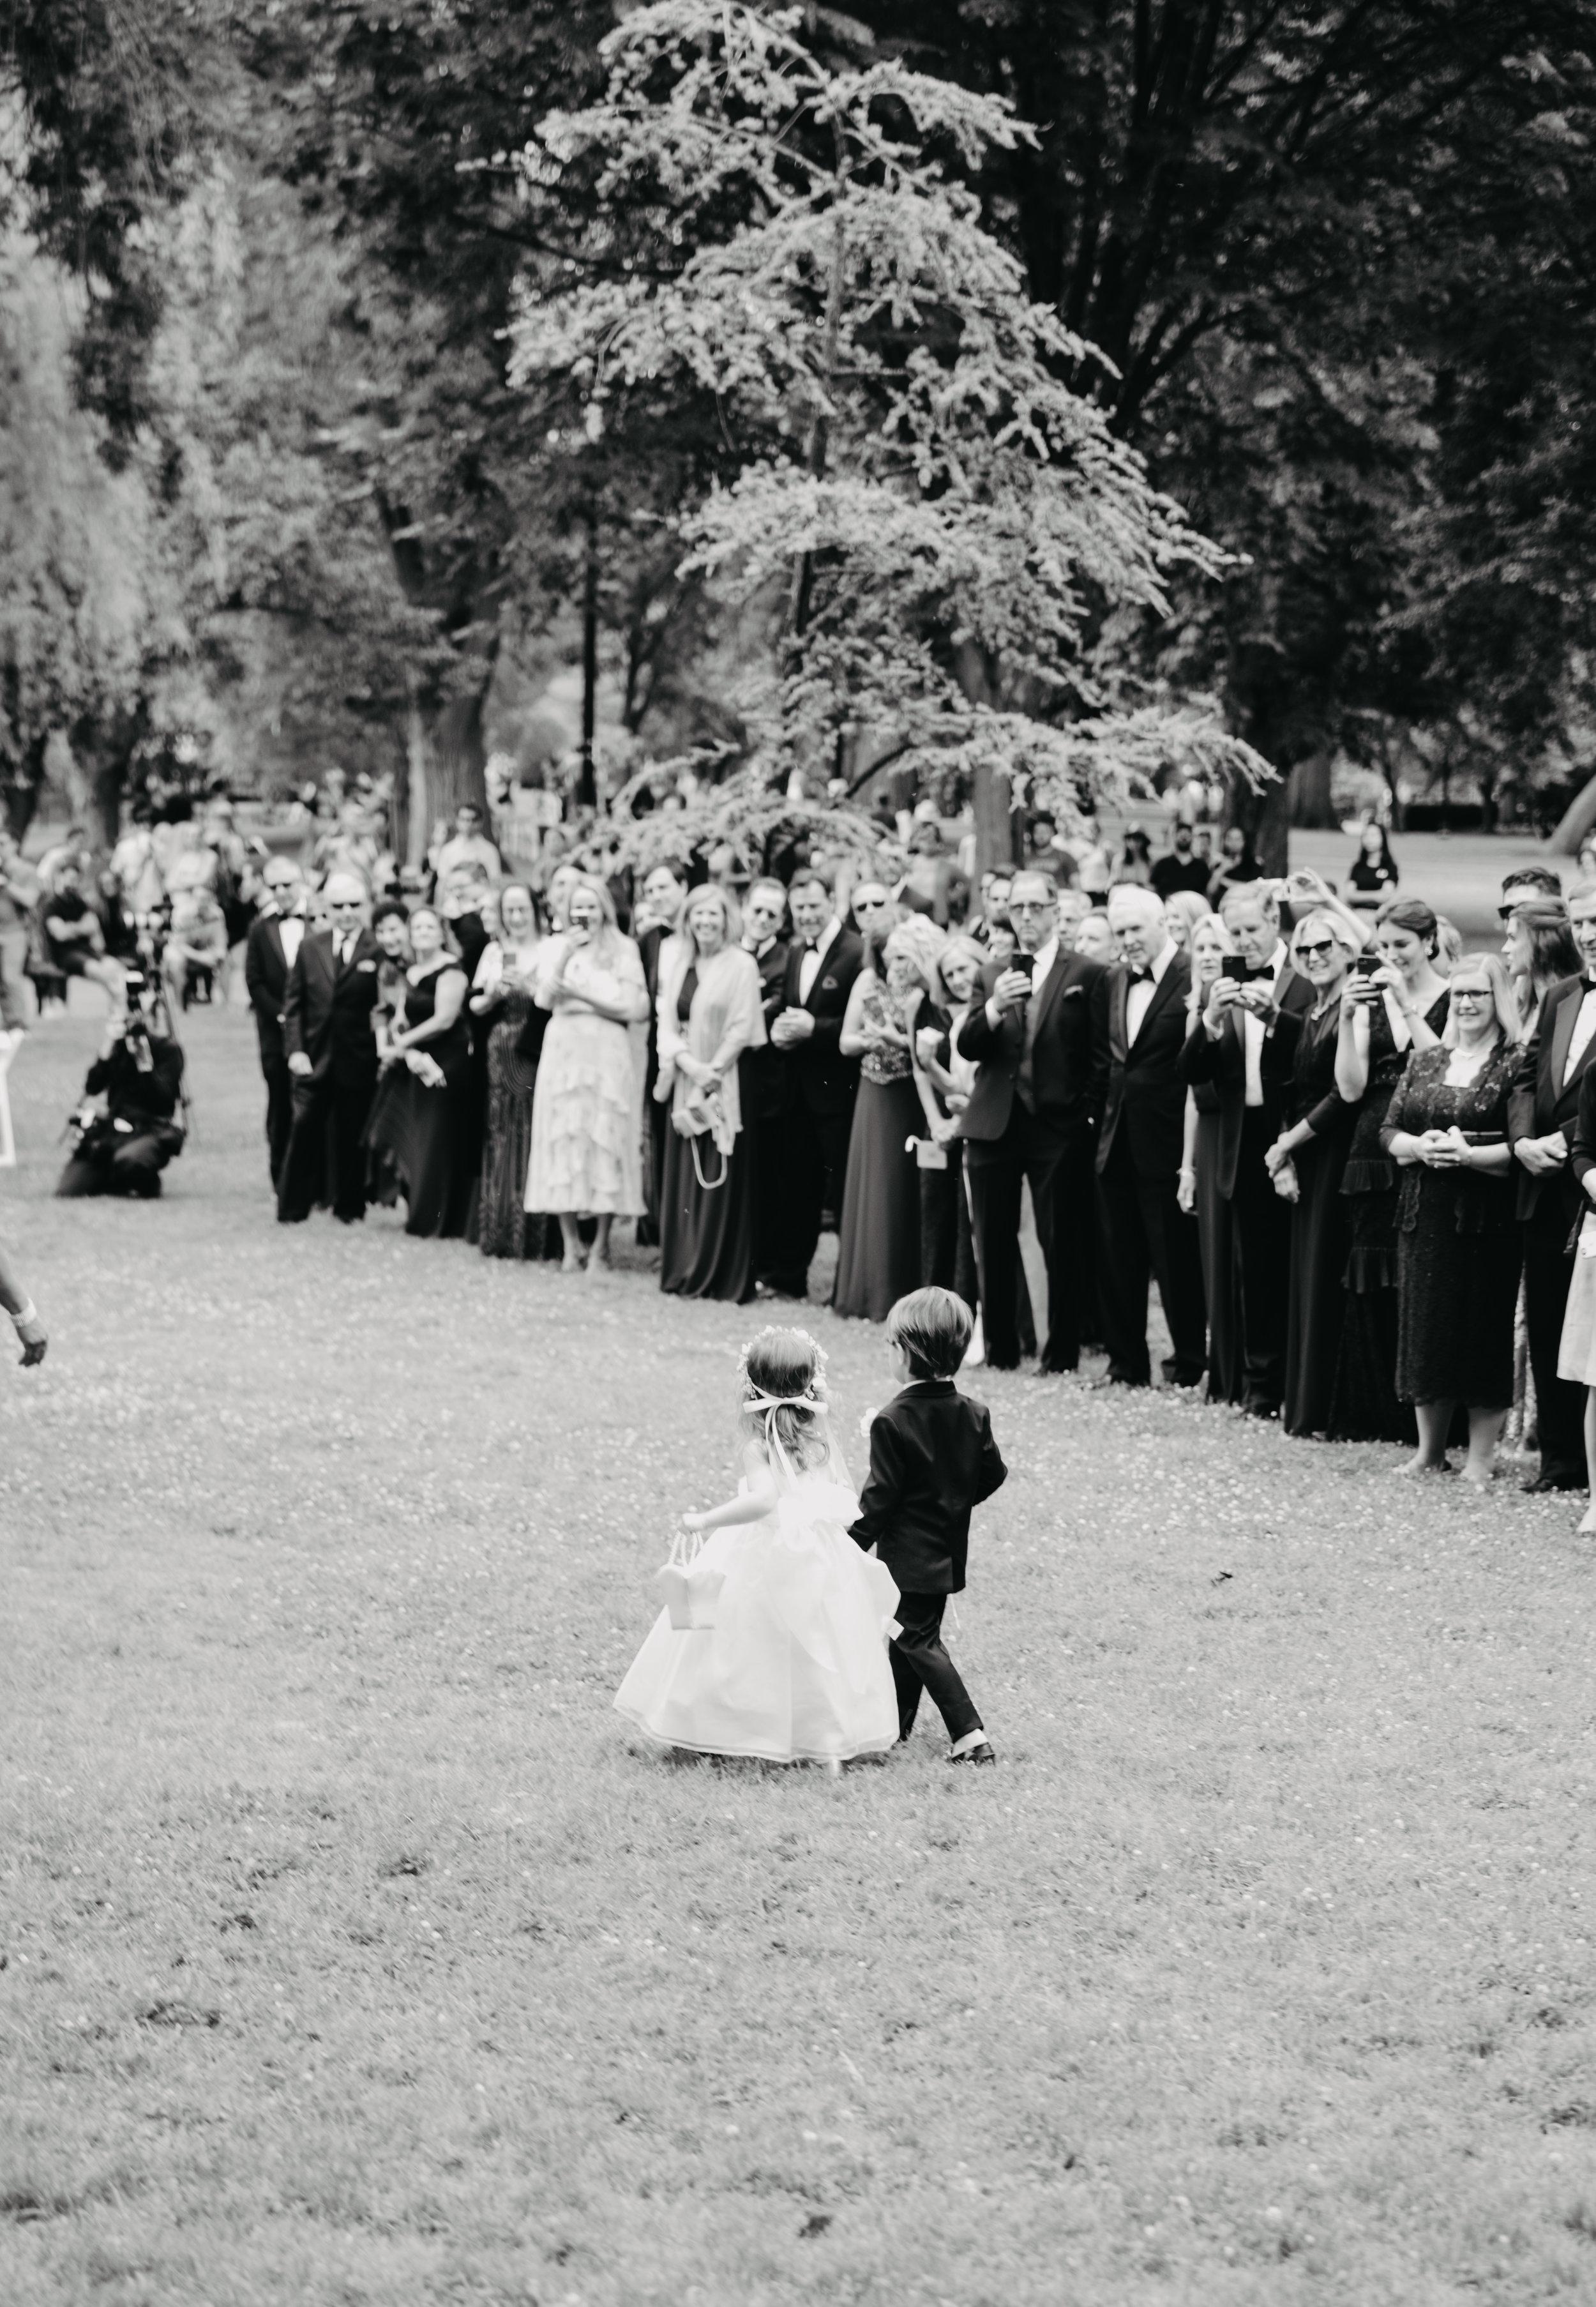 BOSTON PUBLIC GARDEN WEDDING, GARDEN WEDDING, BOSTON WEDDING PLANNER, NICOLE SIMERAL, FOUR SEASONS WEDDING, CLASSIC, TIMELESS, WEDDING WEDDING PLANNER, DESTINATION WEDDING, FLOWER GIRL, RING BEARER